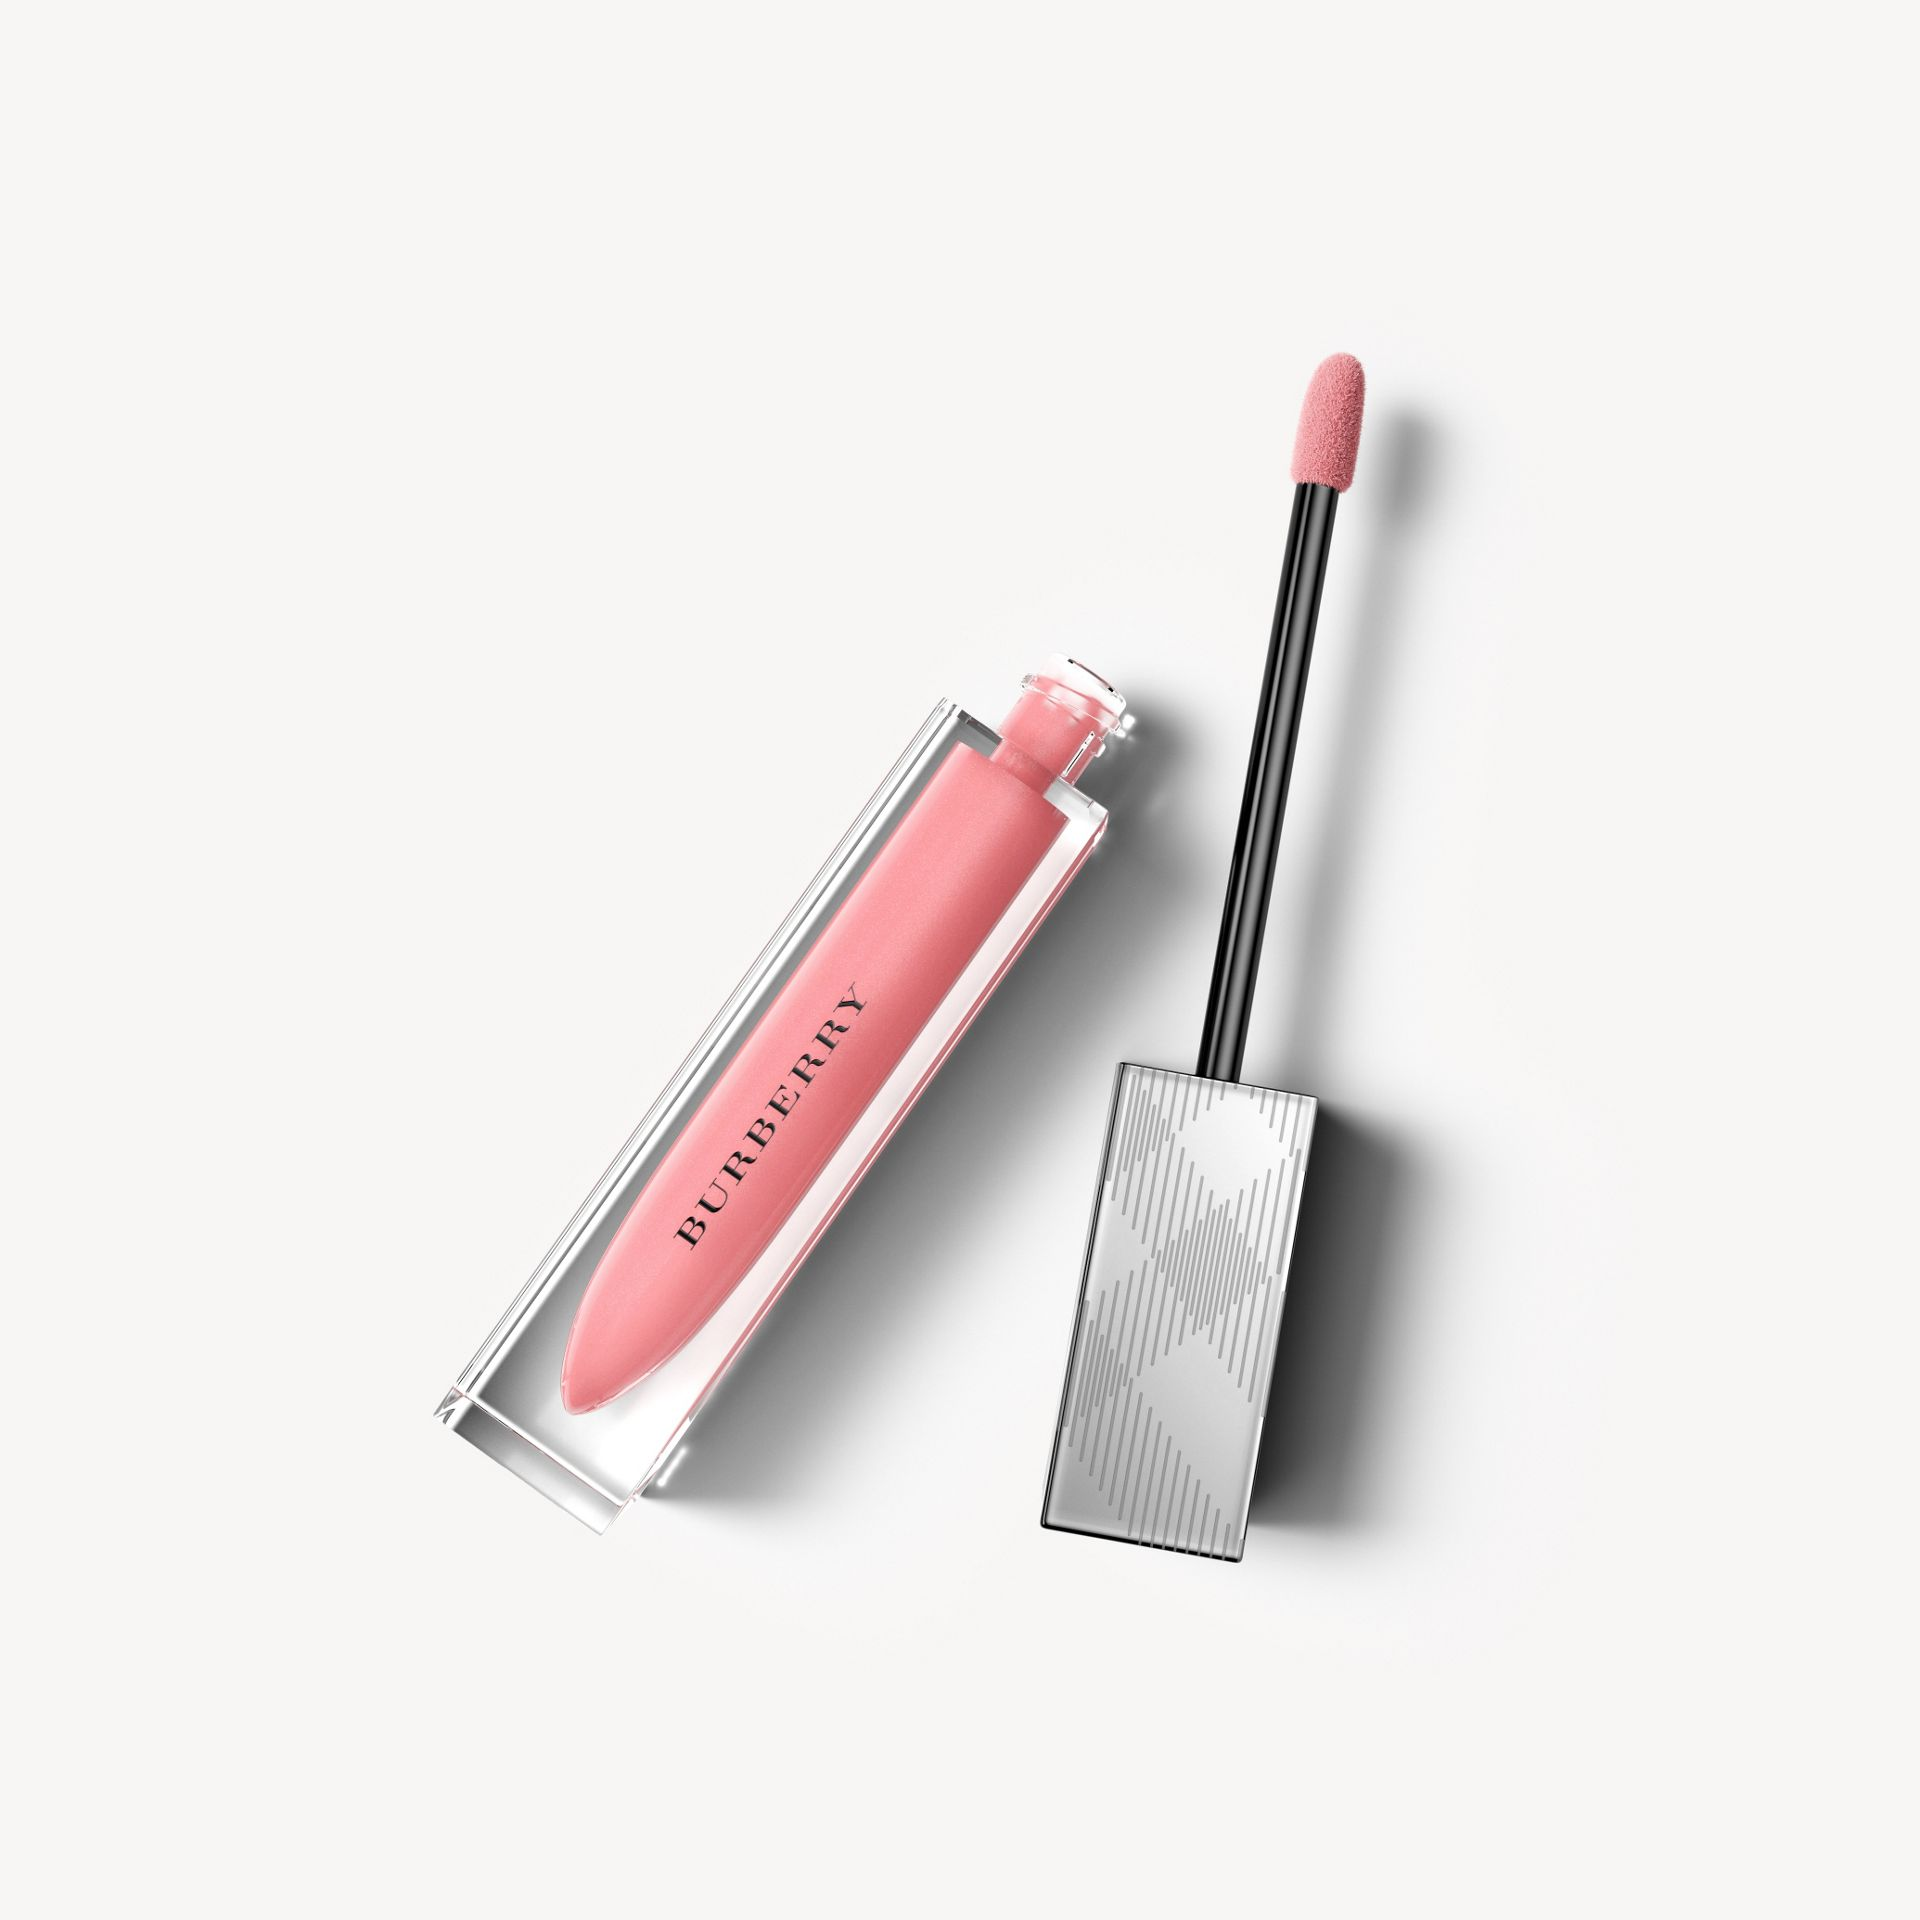 Mallow pink 19 Lip Glow - Mallow Pink No.19 - gallery image 1